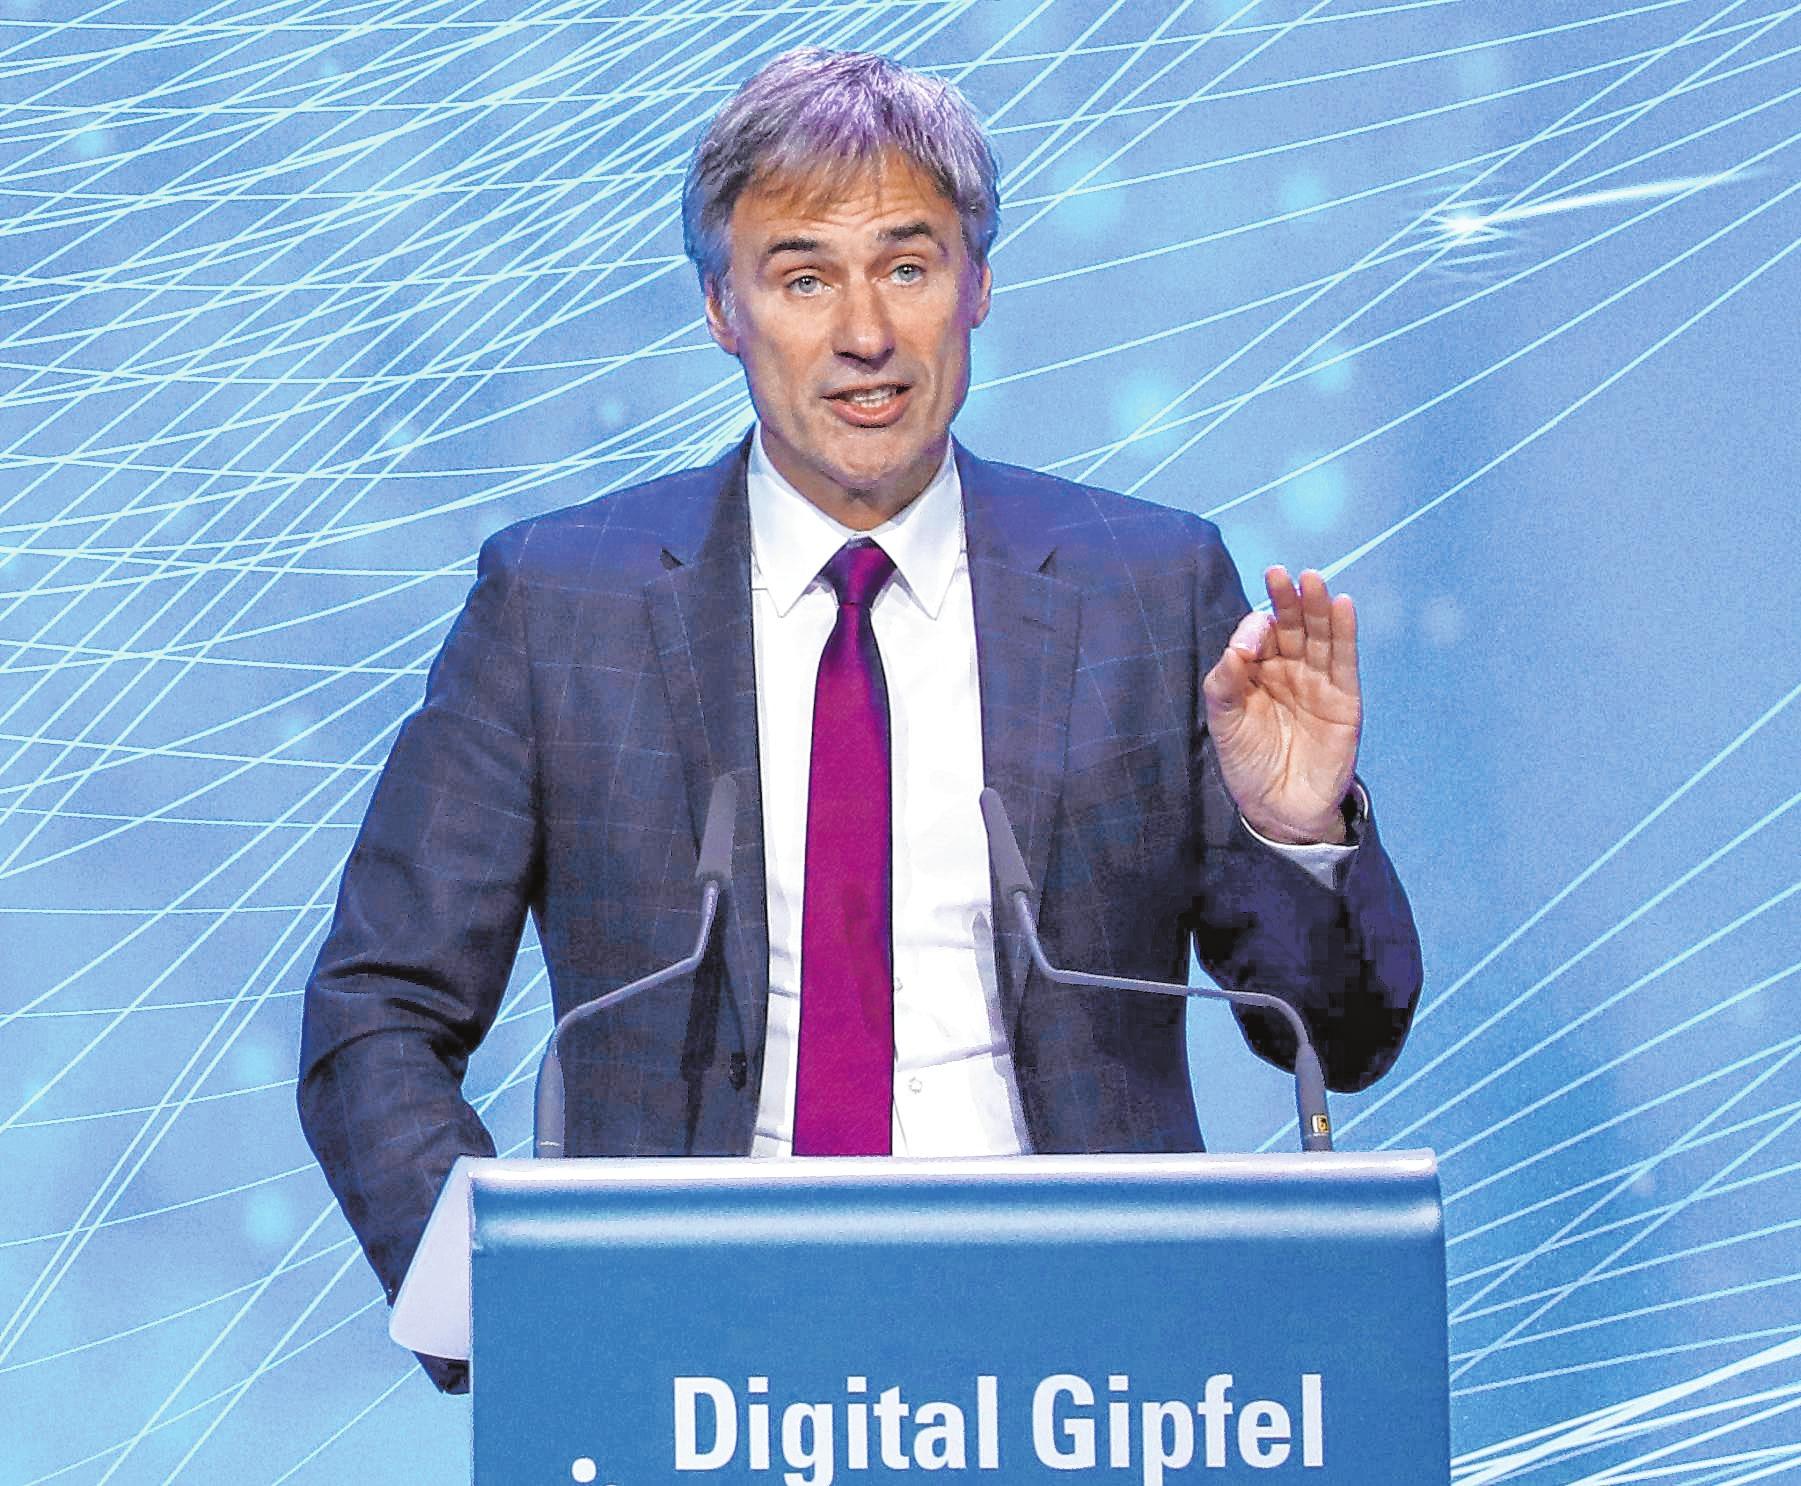 Bitkom: Digital-Branche ist Jobmotor